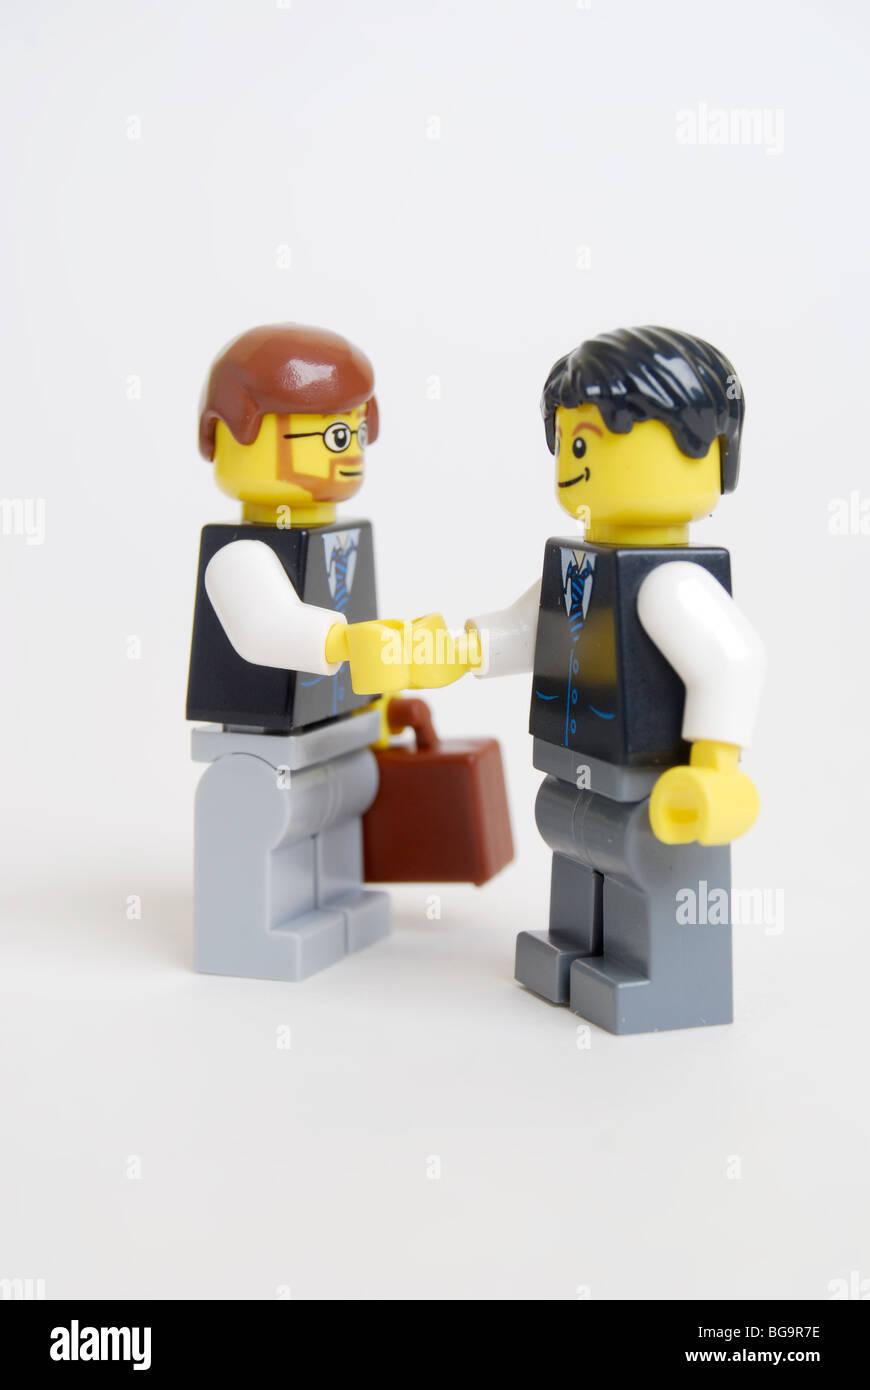 Business people Business men handshake deal agreement lego men smiling Stock Photo